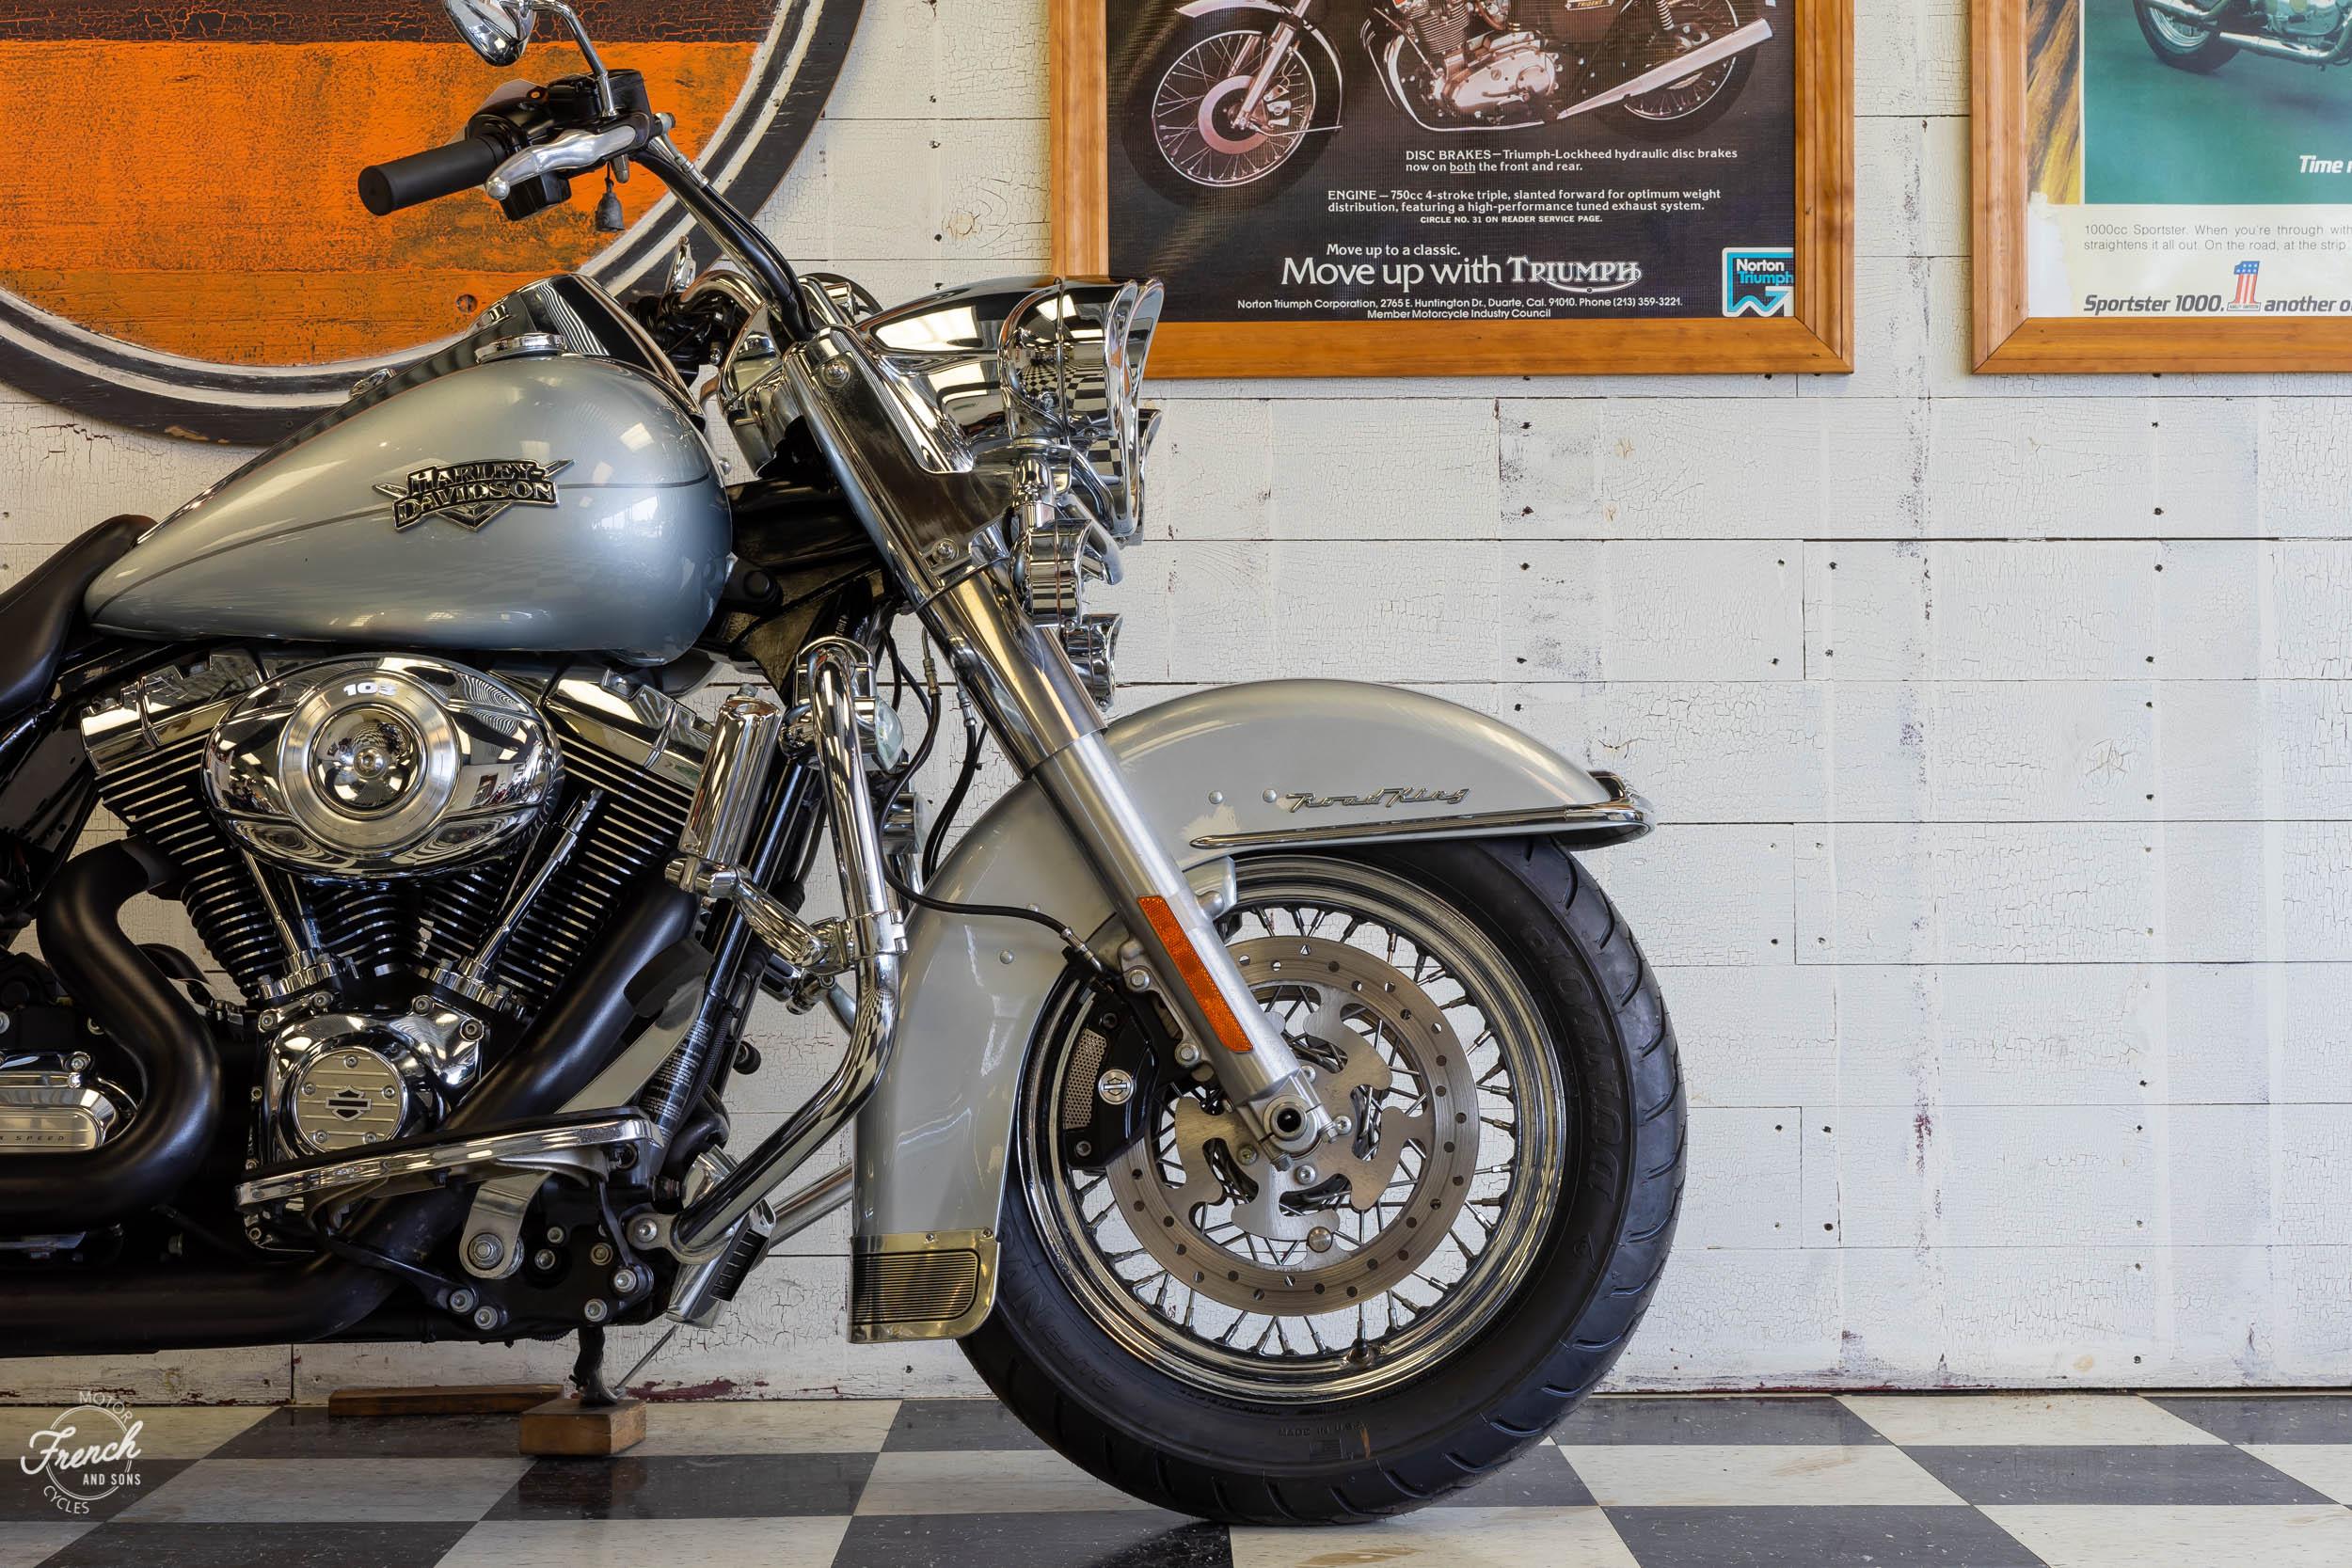 2011_Harley_davidson_road_king_silver-5.jpg